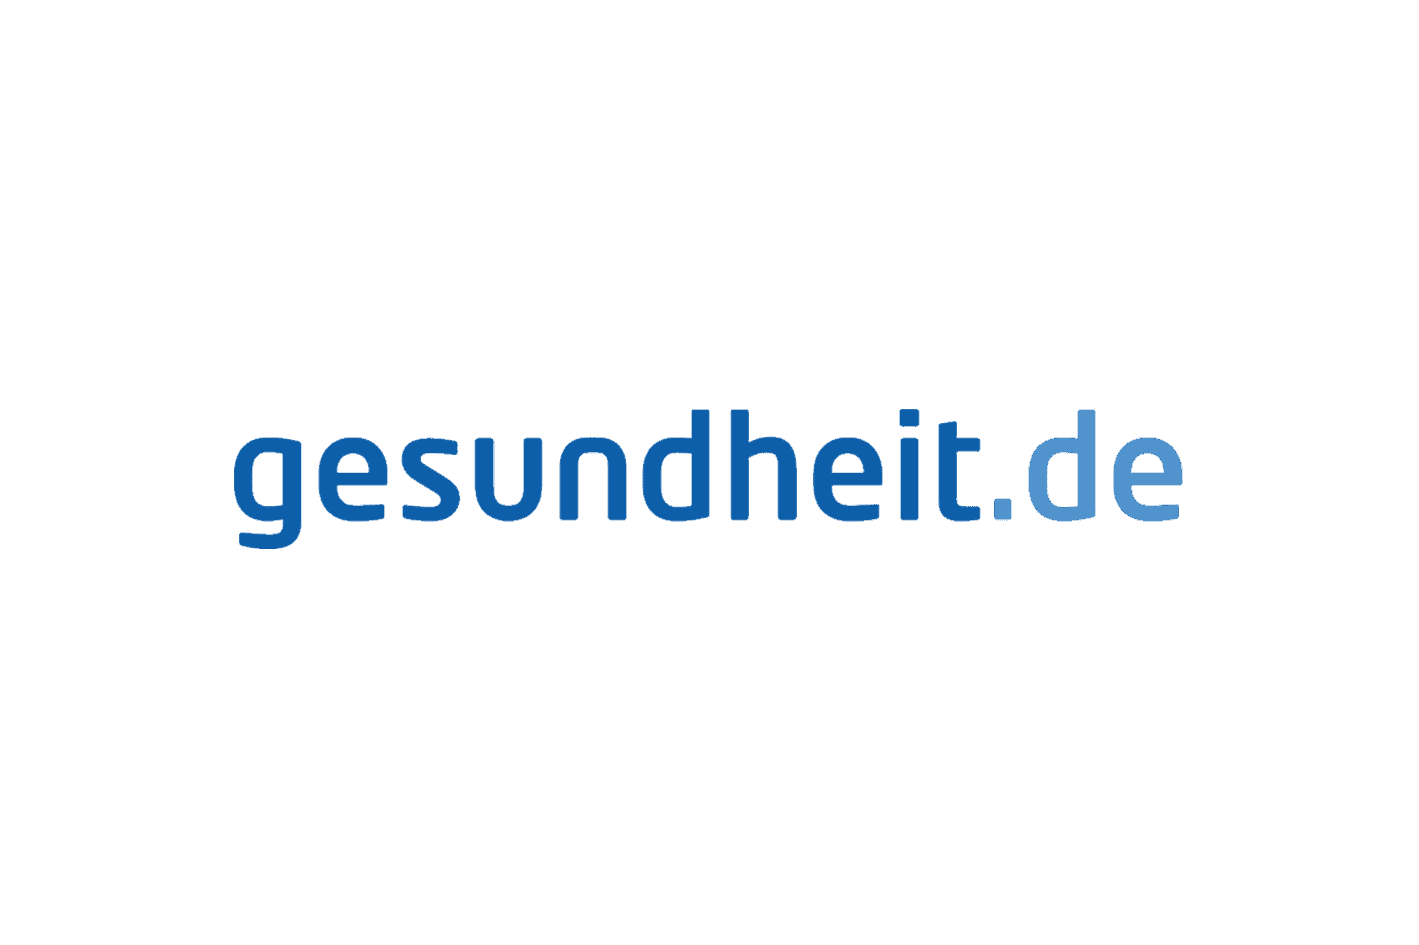 Logo-gesundheit-de